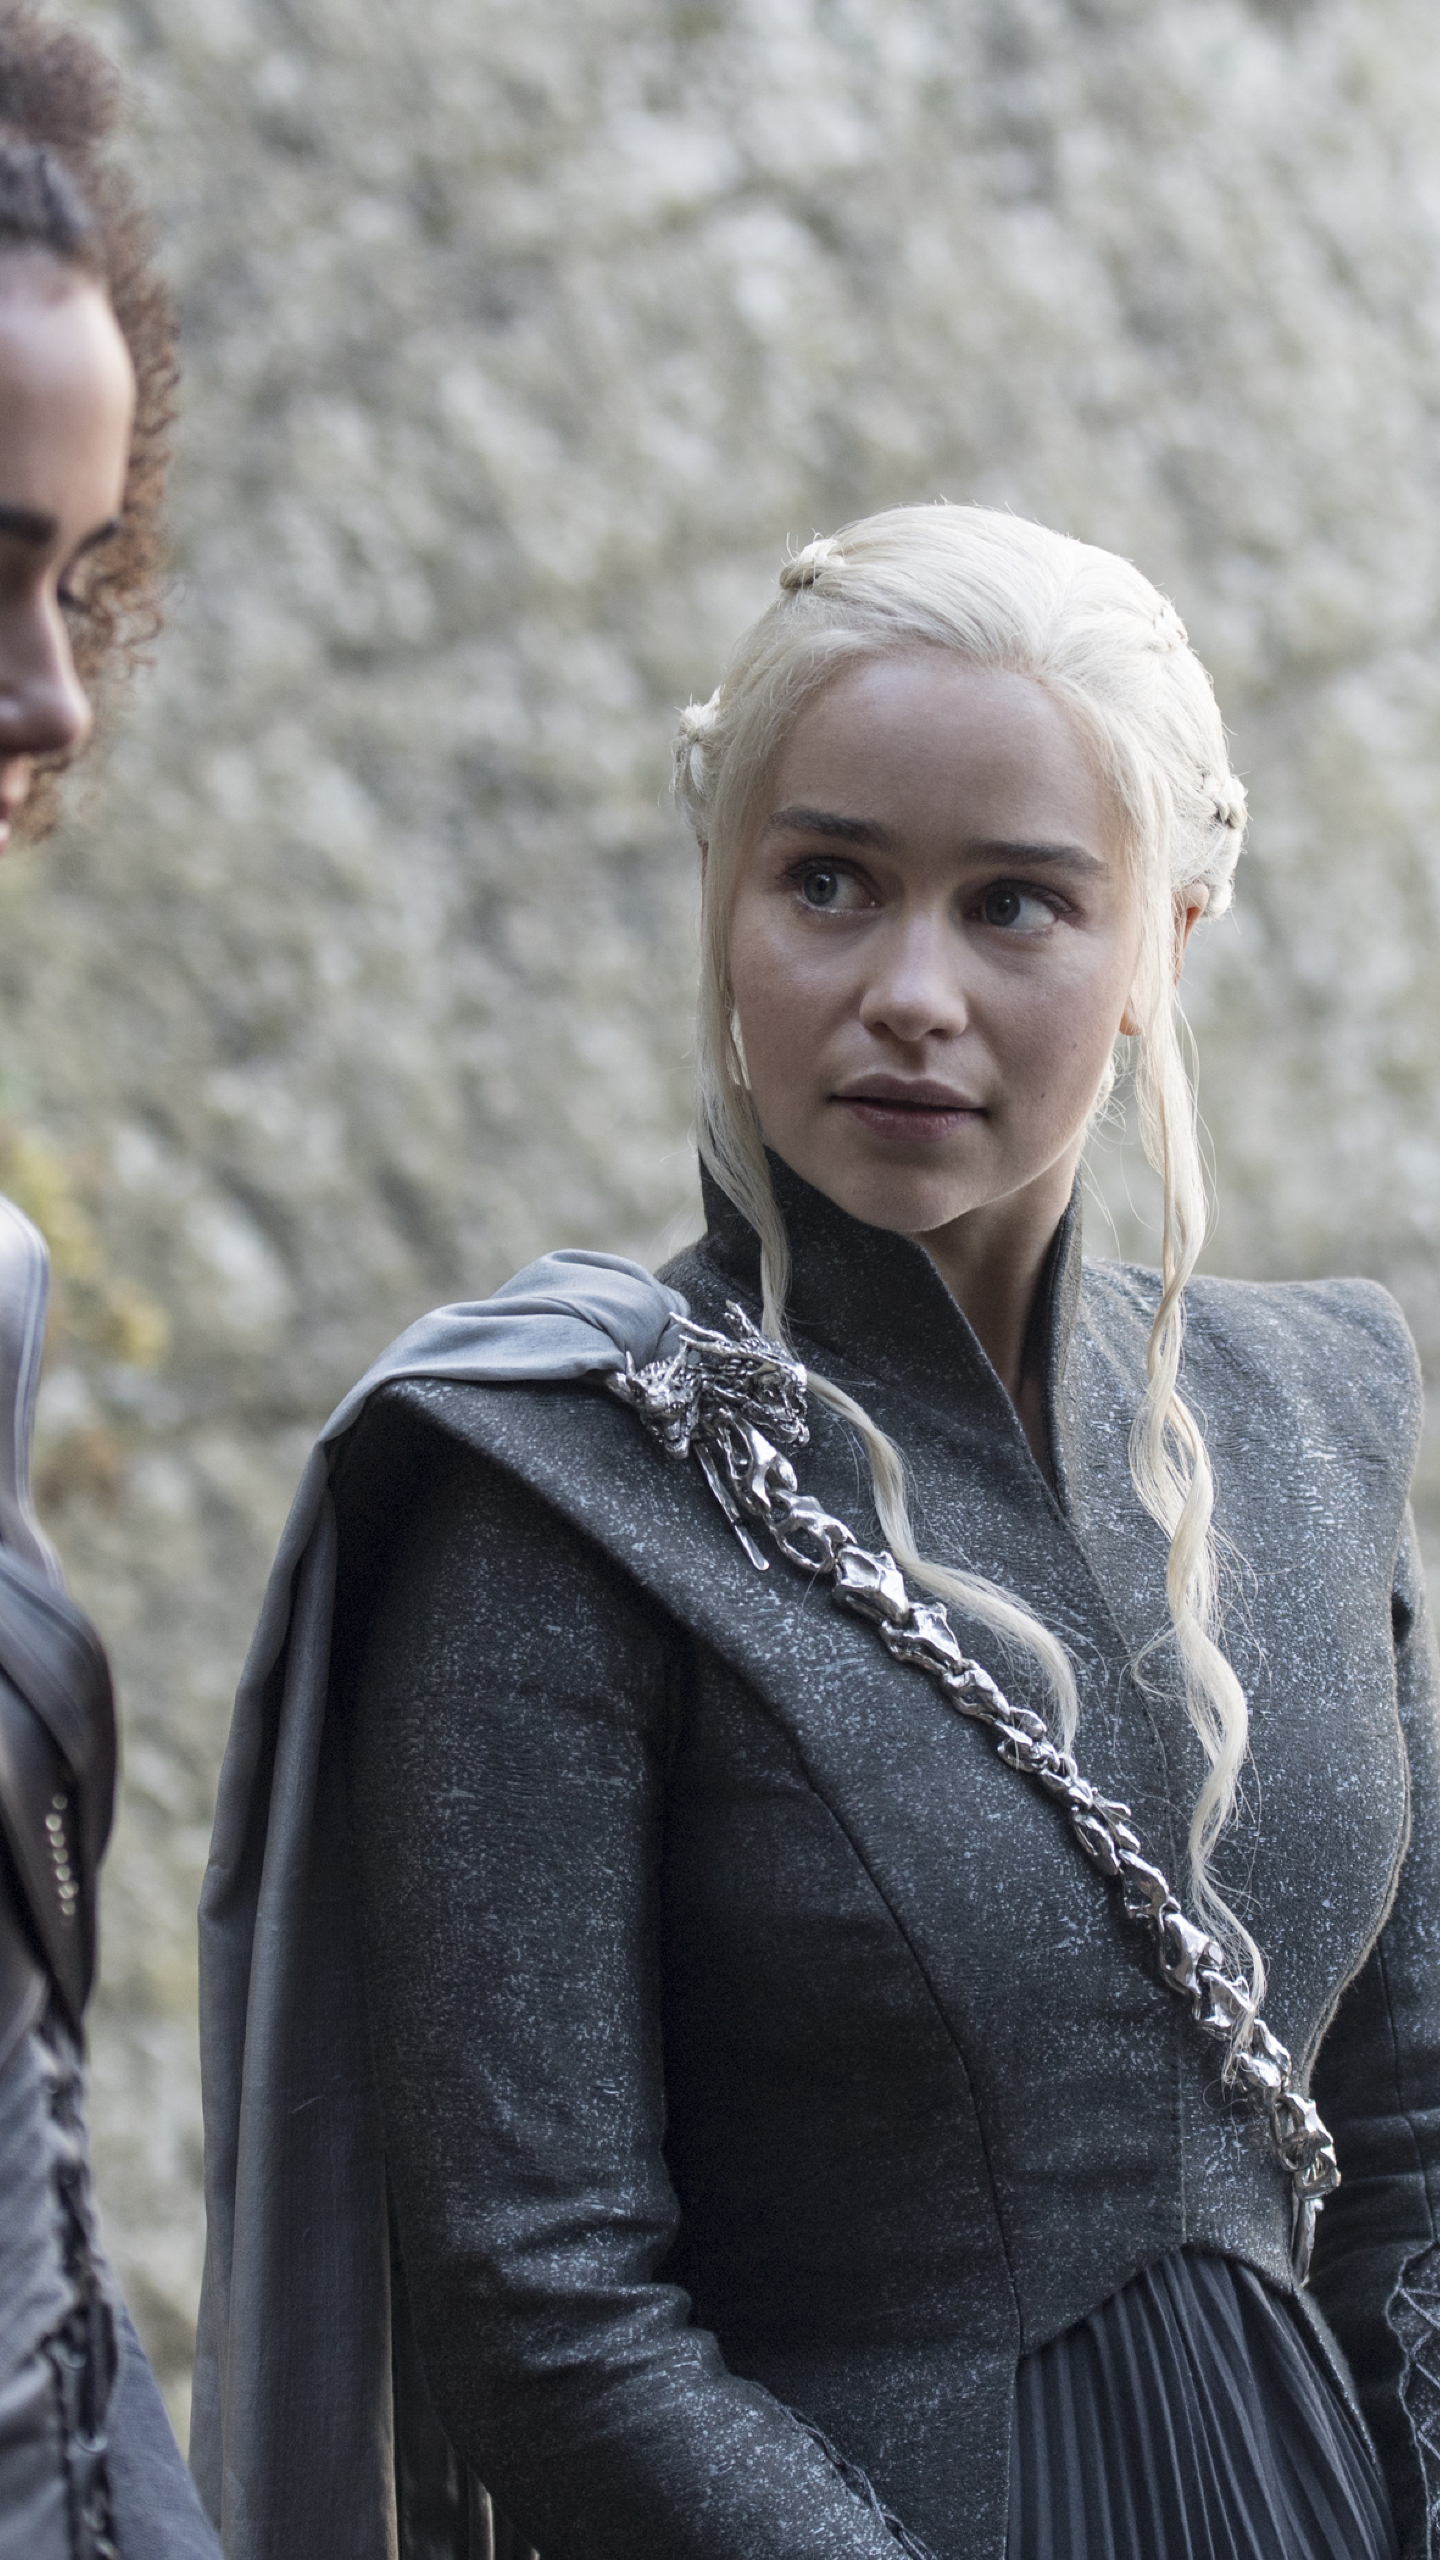 Missandei Dany Game Of Thrones Season 7, HD 4K Wallpaper Dany Game Of Thrones